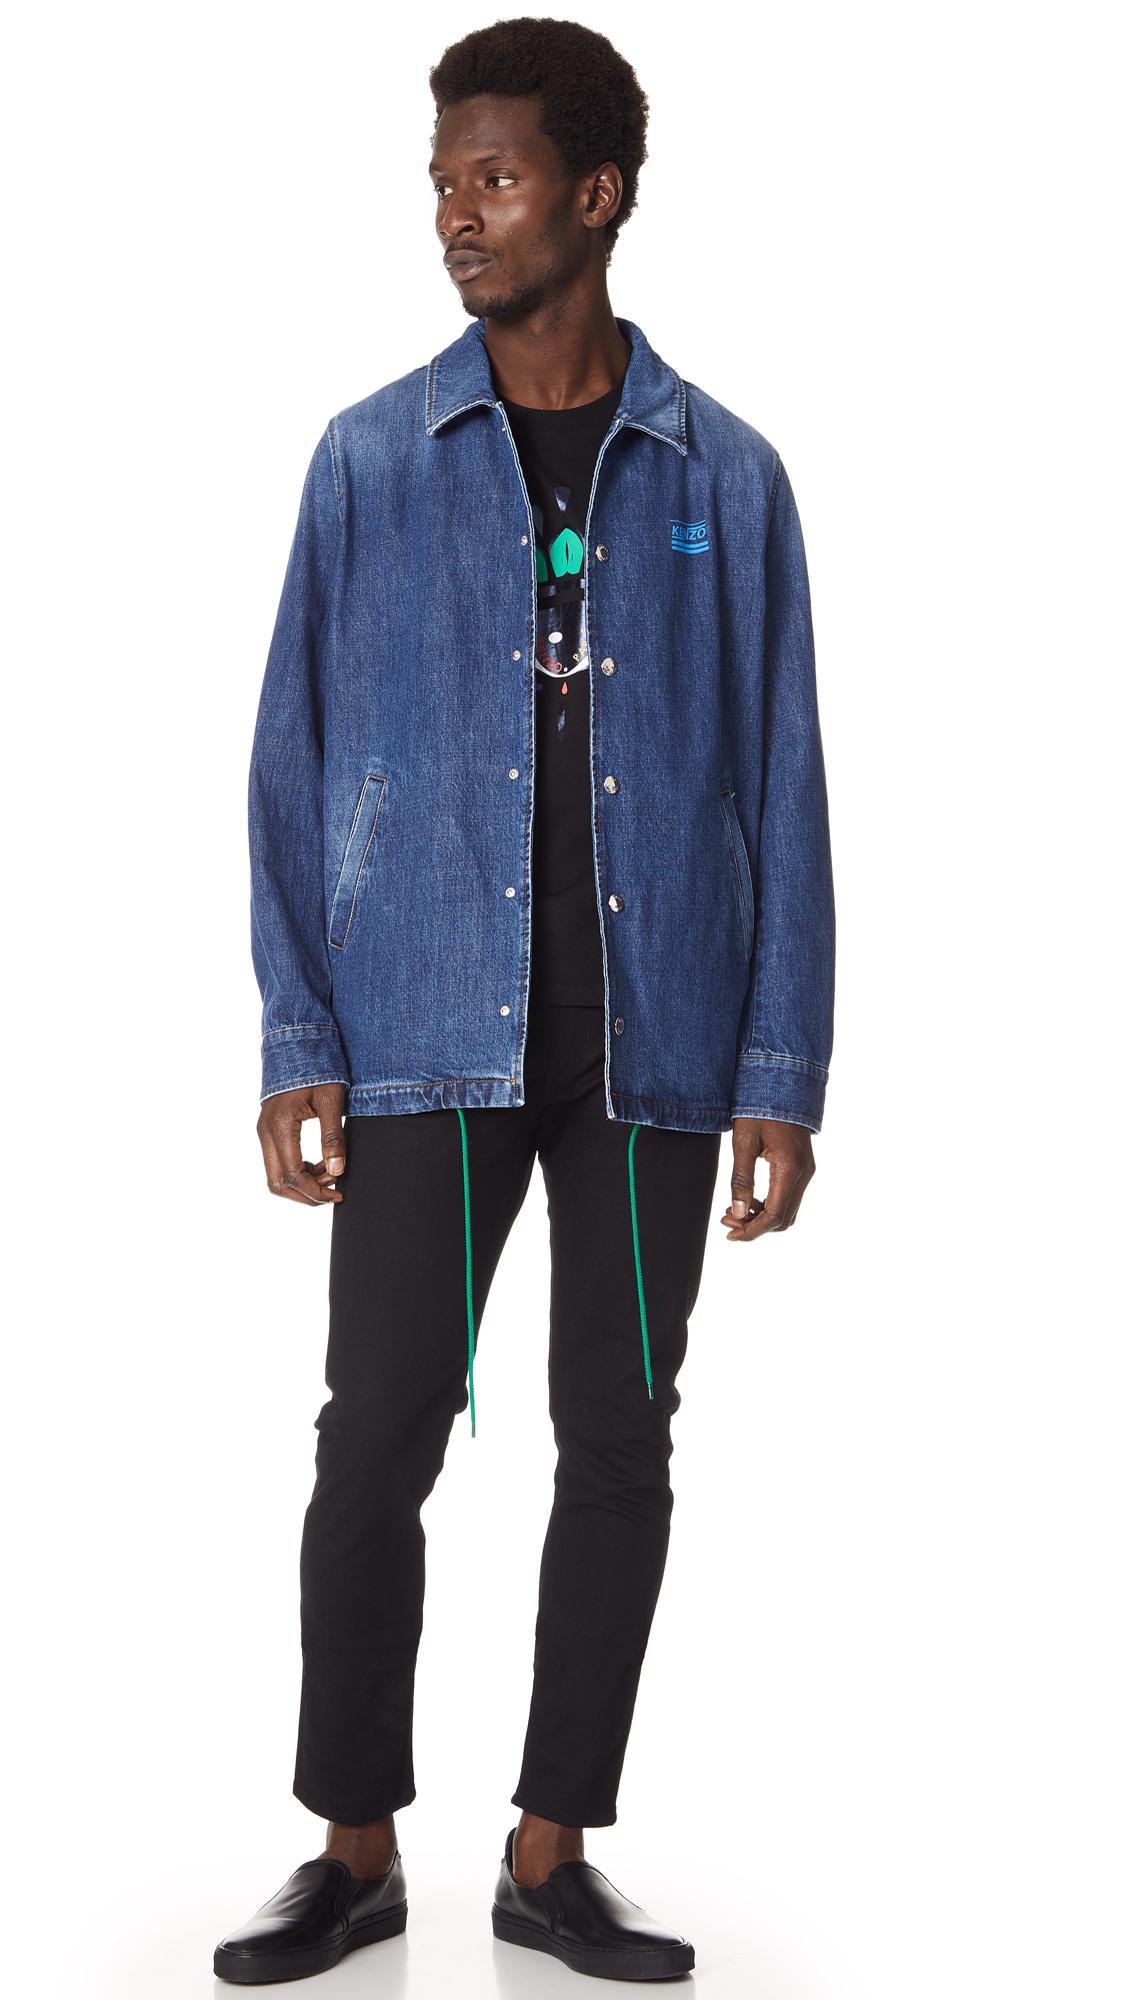 KENZO Denim Coach Jacket in Navy (Blue) for Men